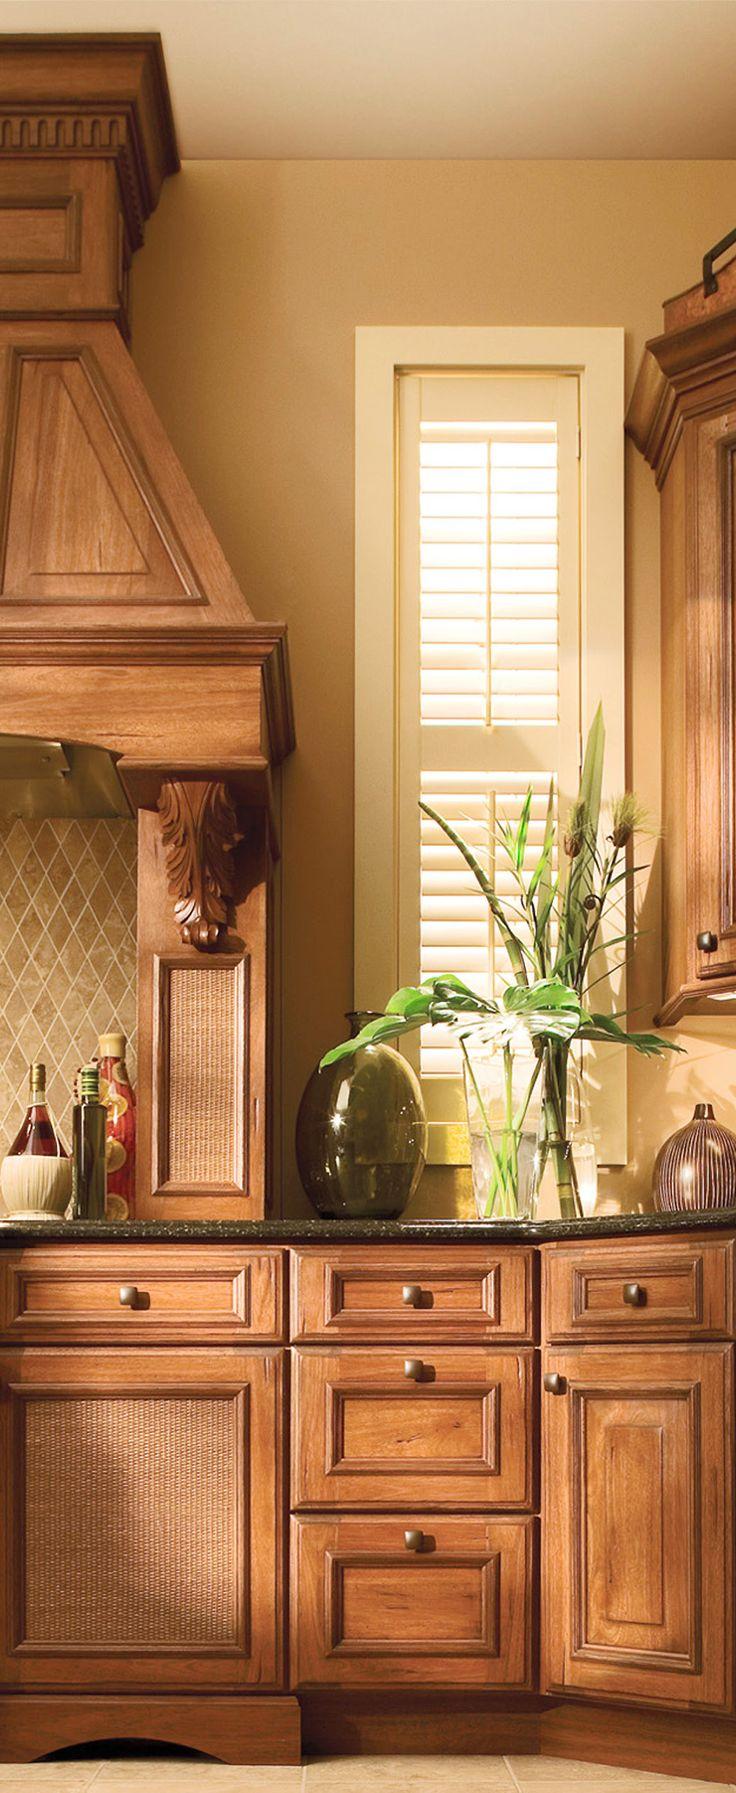 Tropical Kitchen Design With Dura Supreme Cabinetry Tropical Kitchen Decor Tropical Kitchen Design Tropical Kitchen